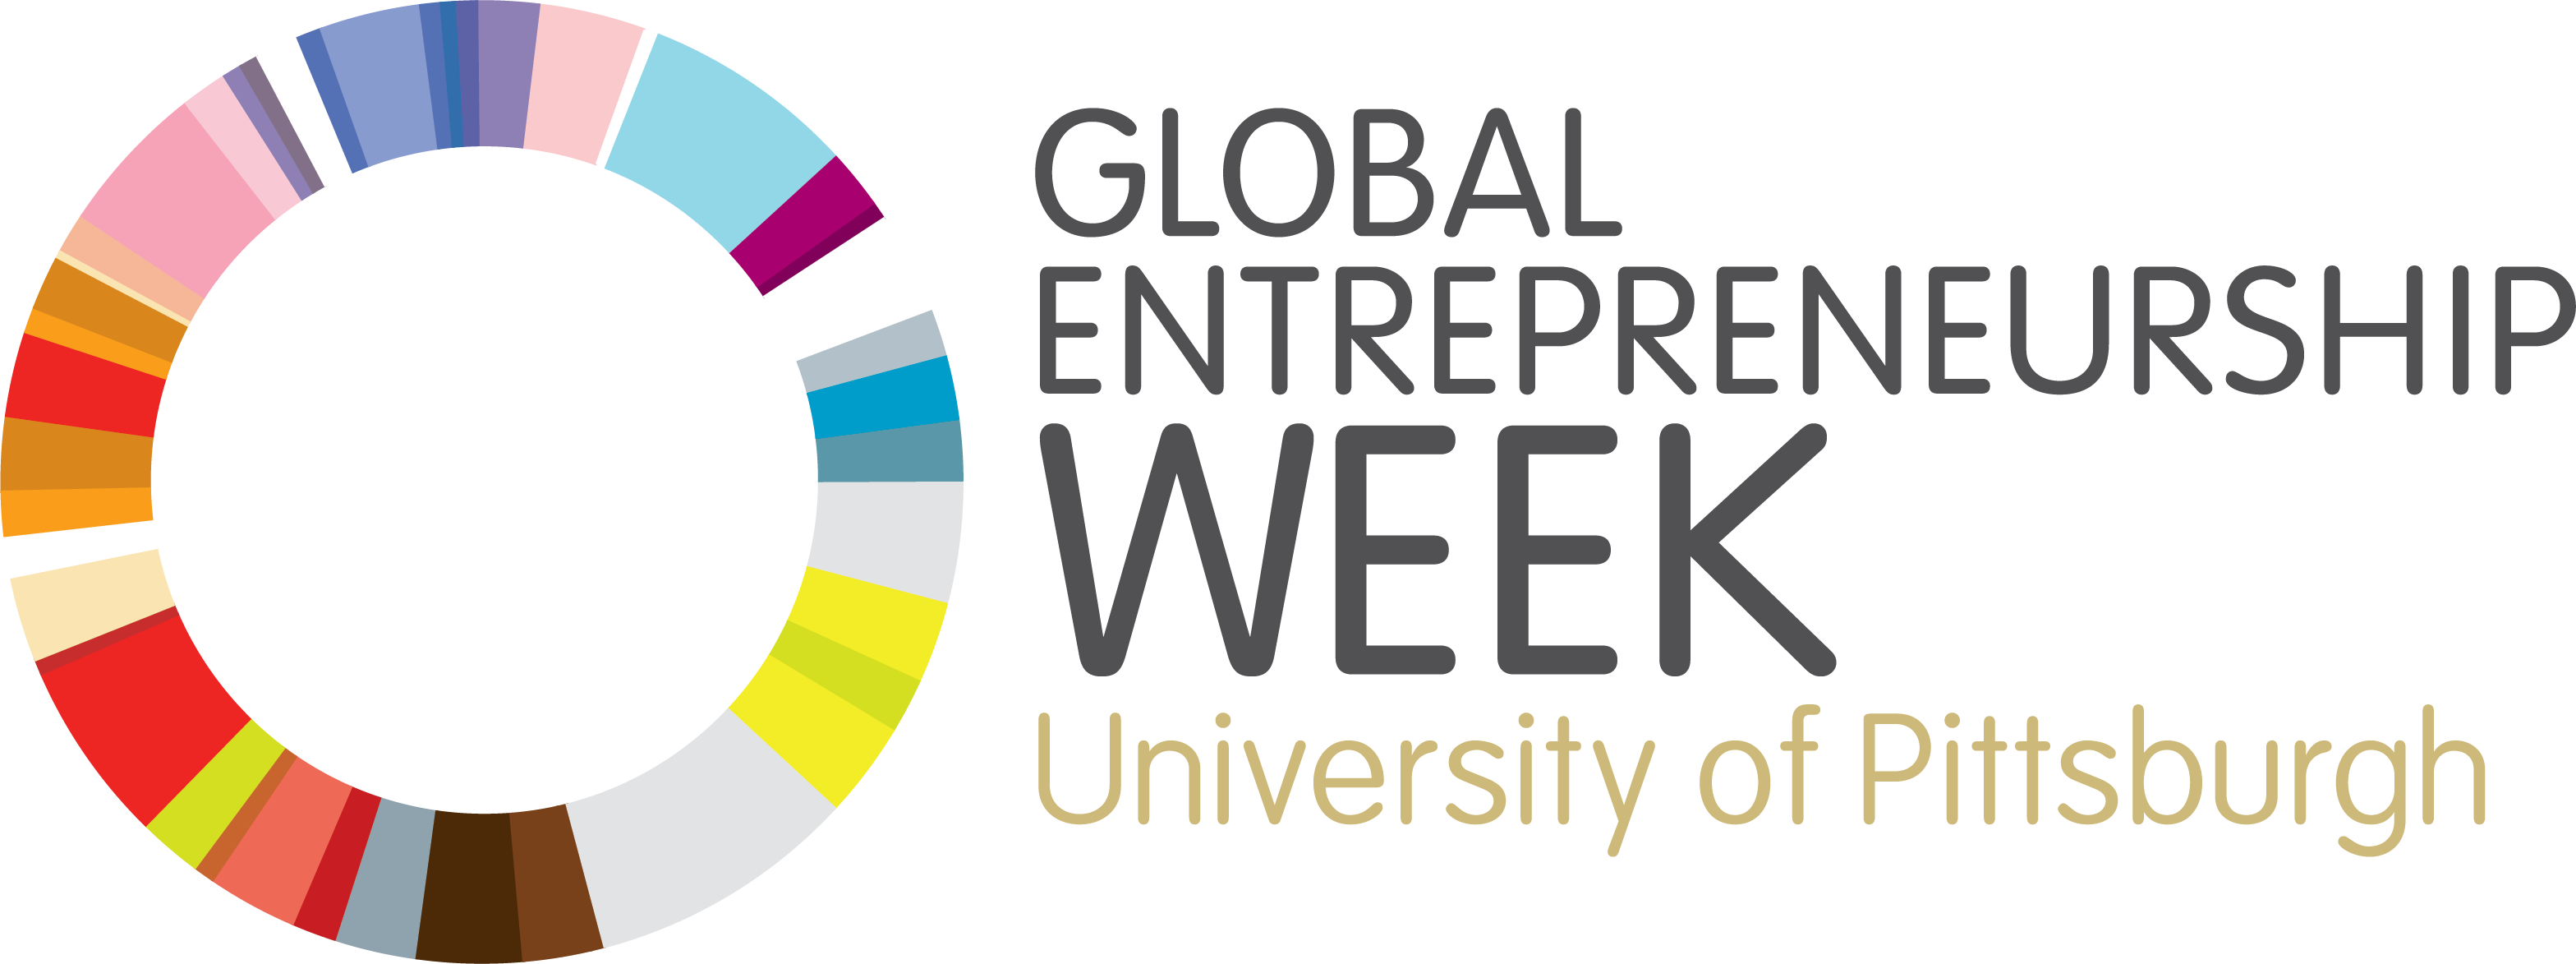 university of pittsburgh global entrepreneurship week